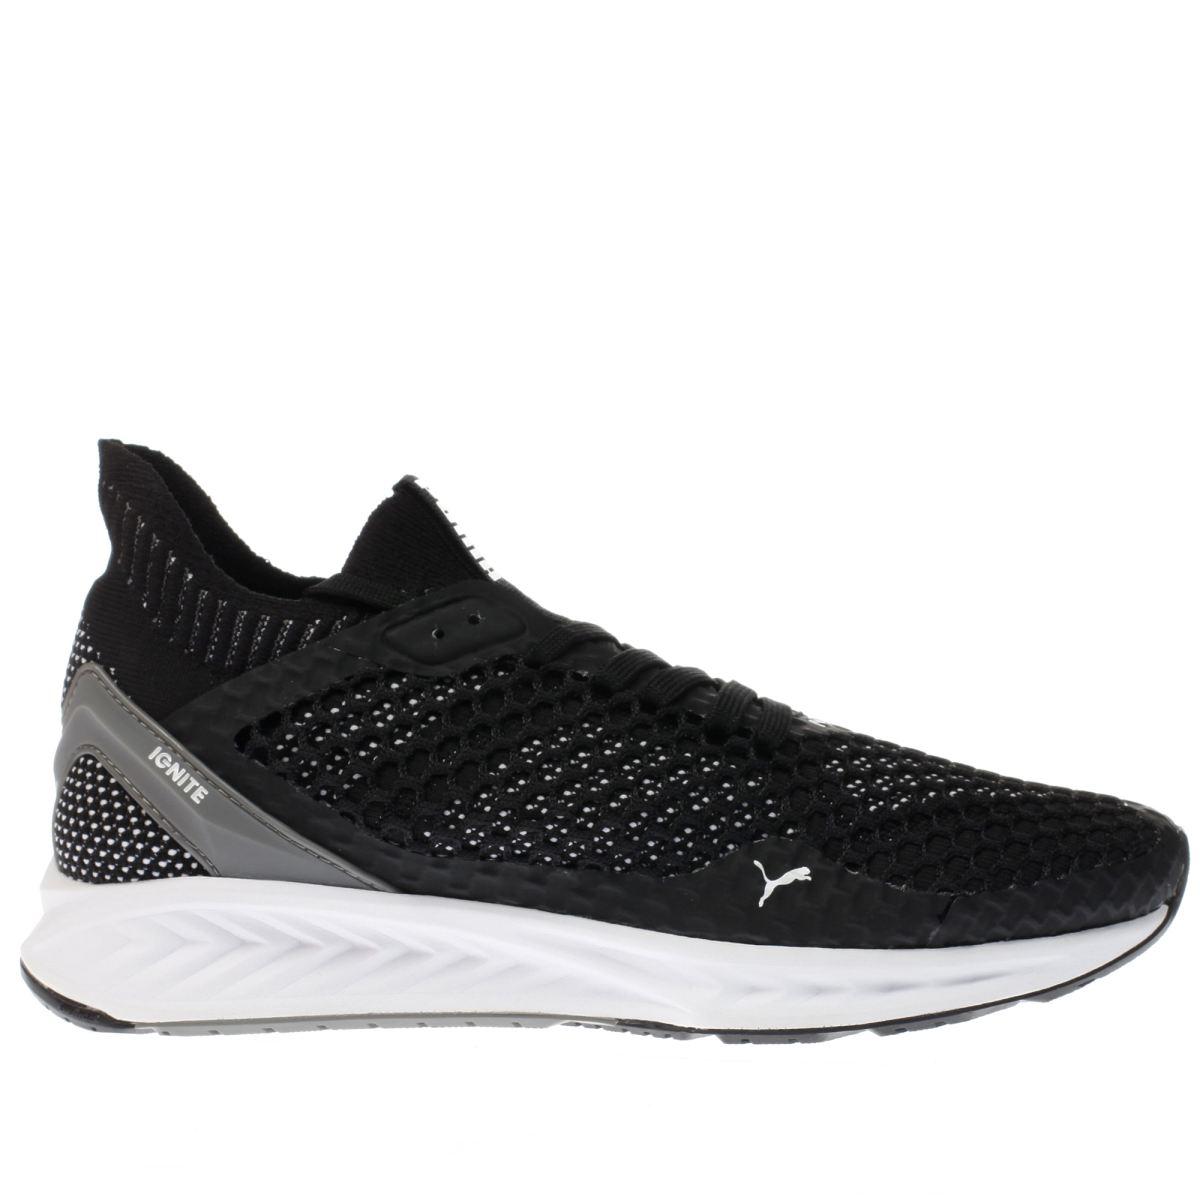 puma black & white ignite netfit trainers